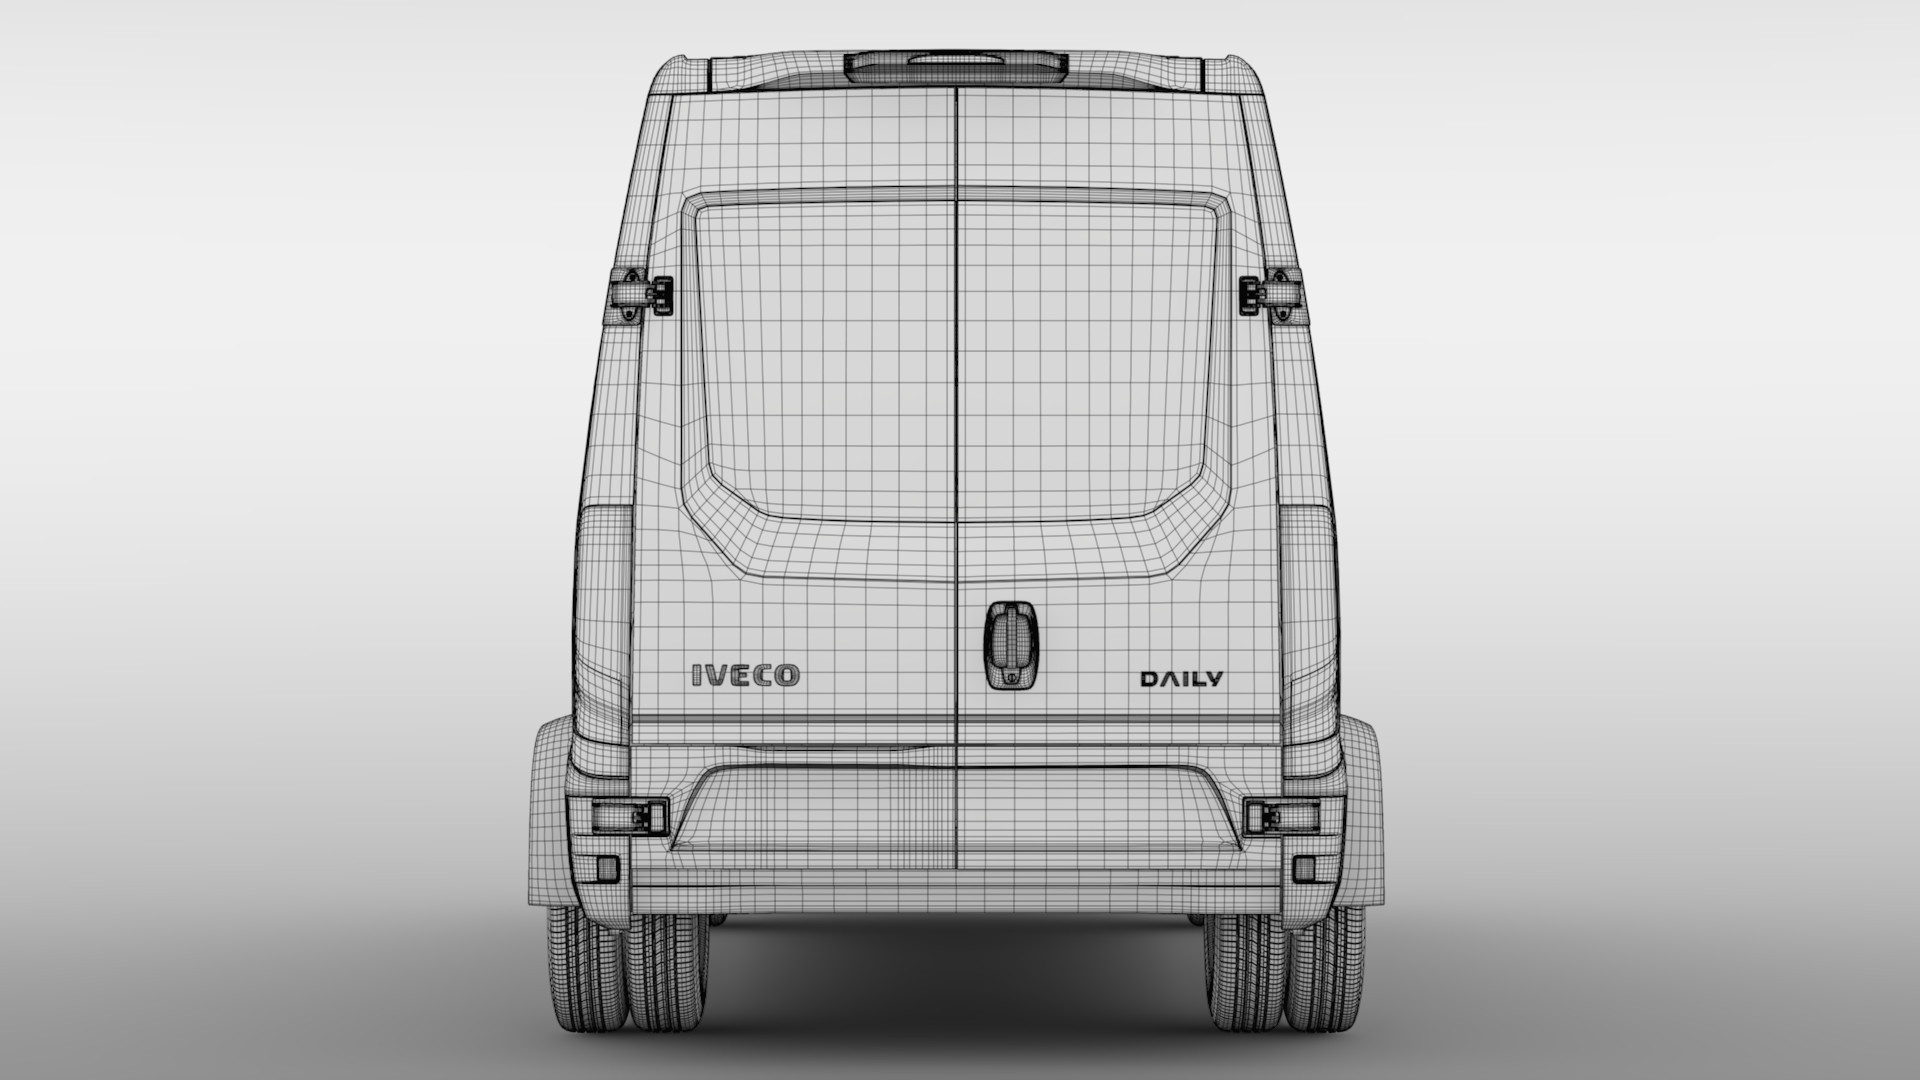 iveco daily minibus l2h2 2017 3d model max fbx c4d lwo ma mb hrc xsi obj 276027